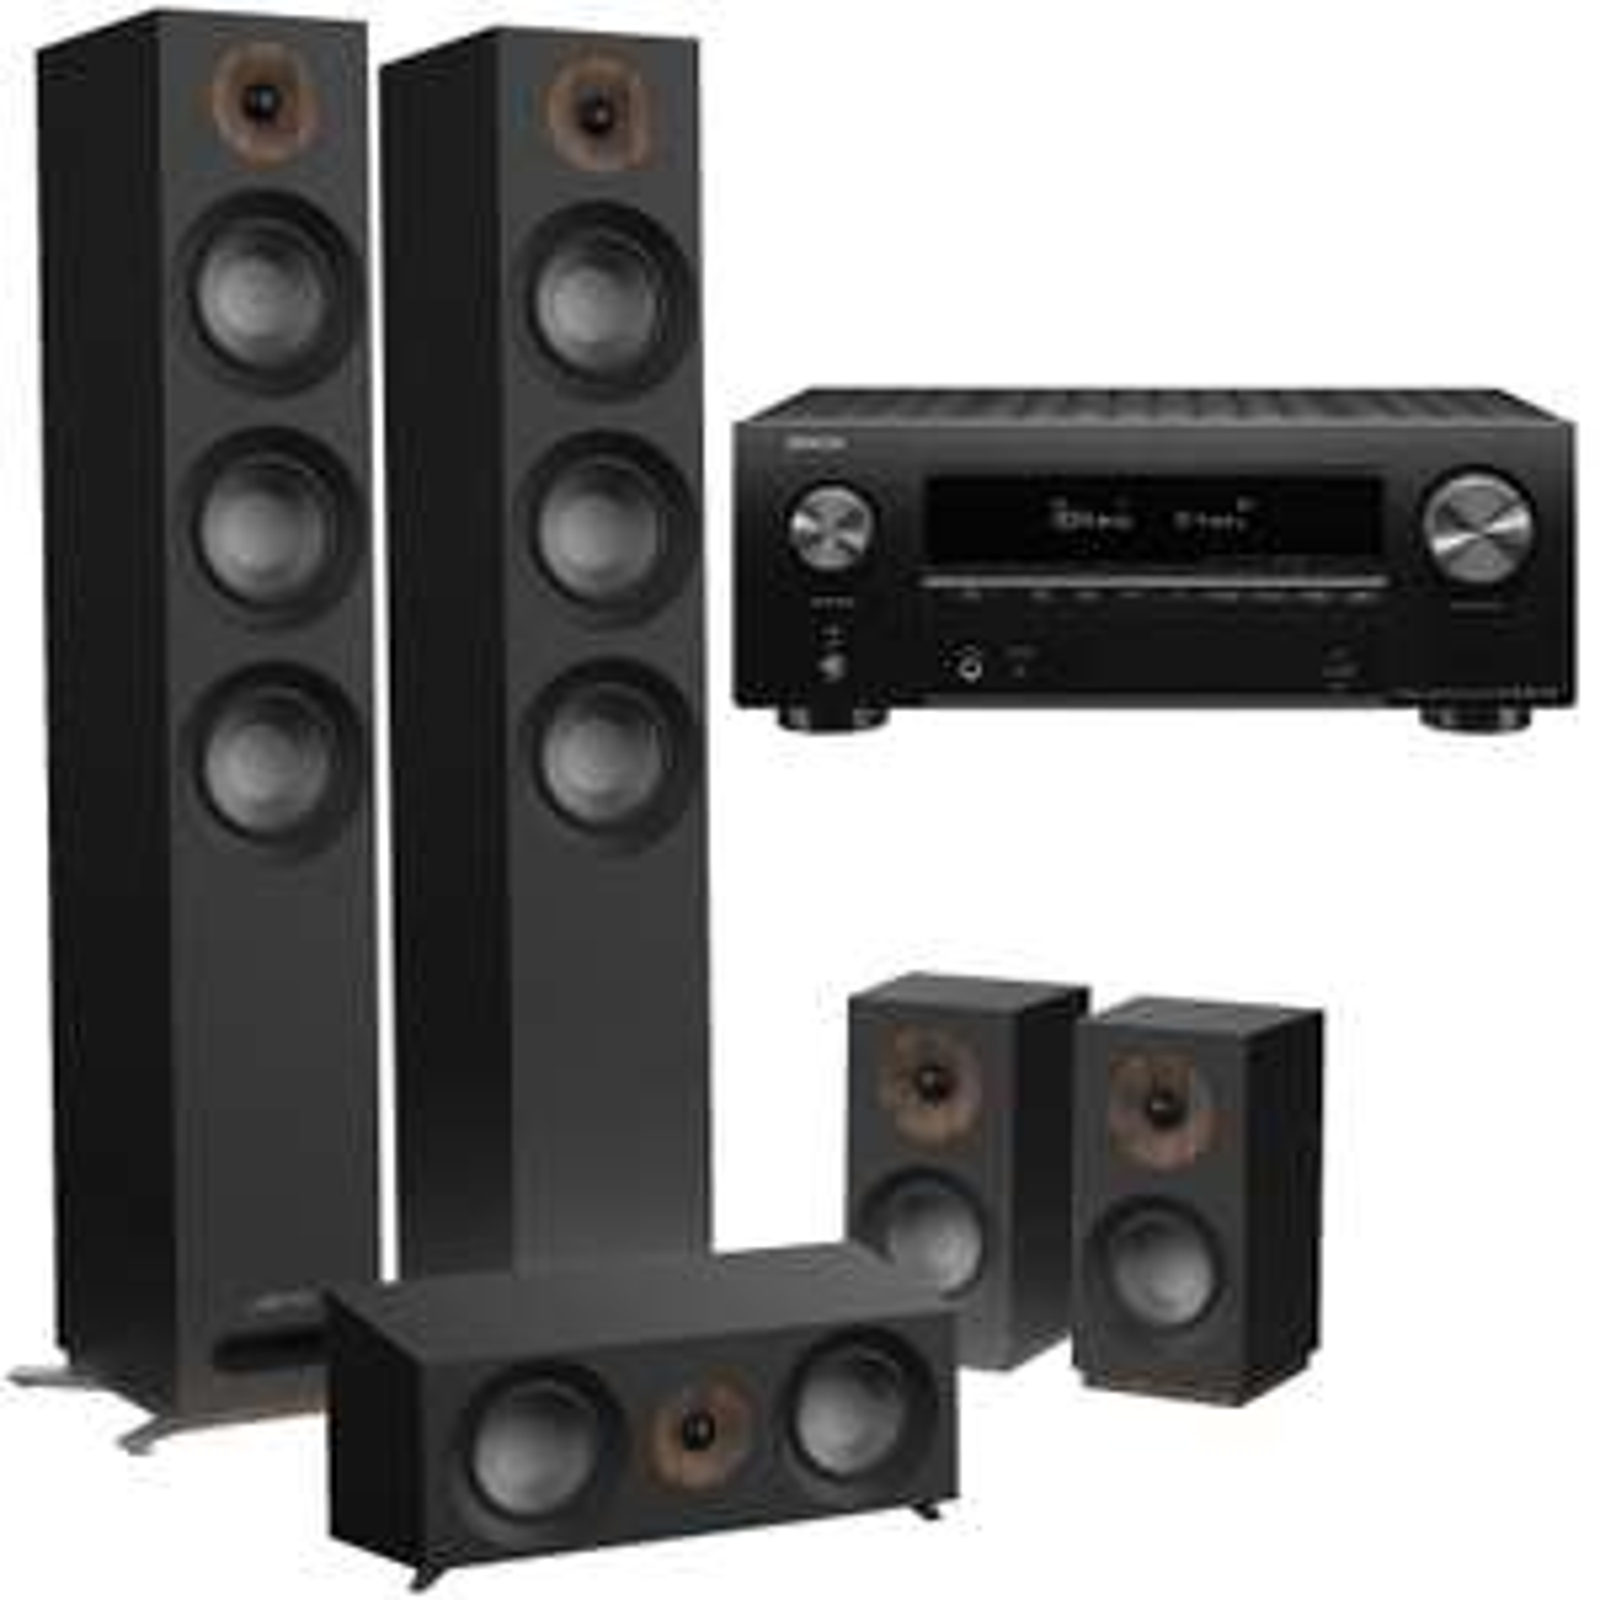 Ampli-tuner Home Cinema Denon AVR-X2700H DAB (Noir) + Kit Enceintes 5.0 Jamo S 809 HCS (Noir)